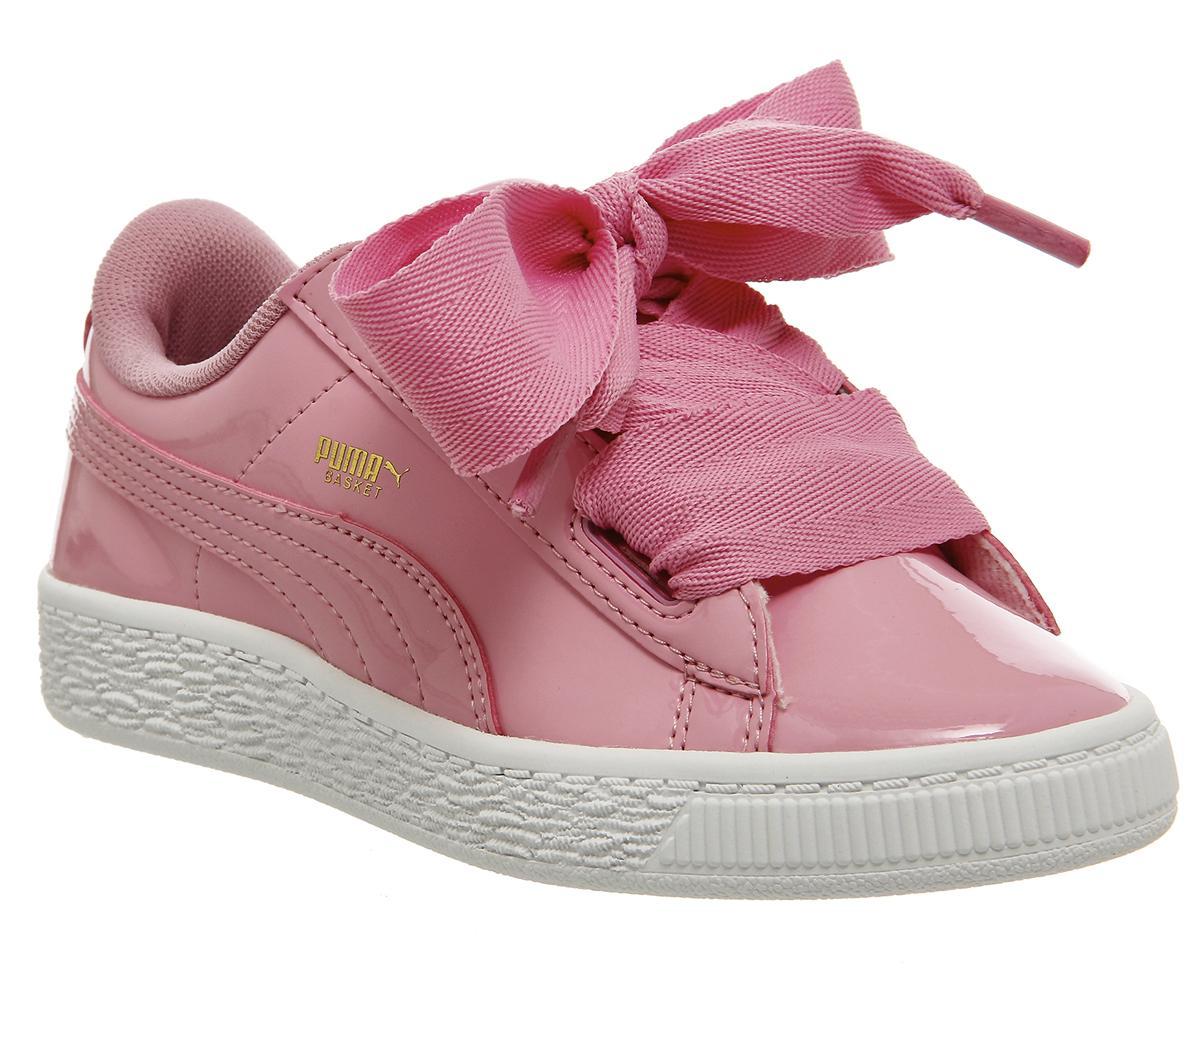 Puma Basket Heart Ps Prism Pink Patent